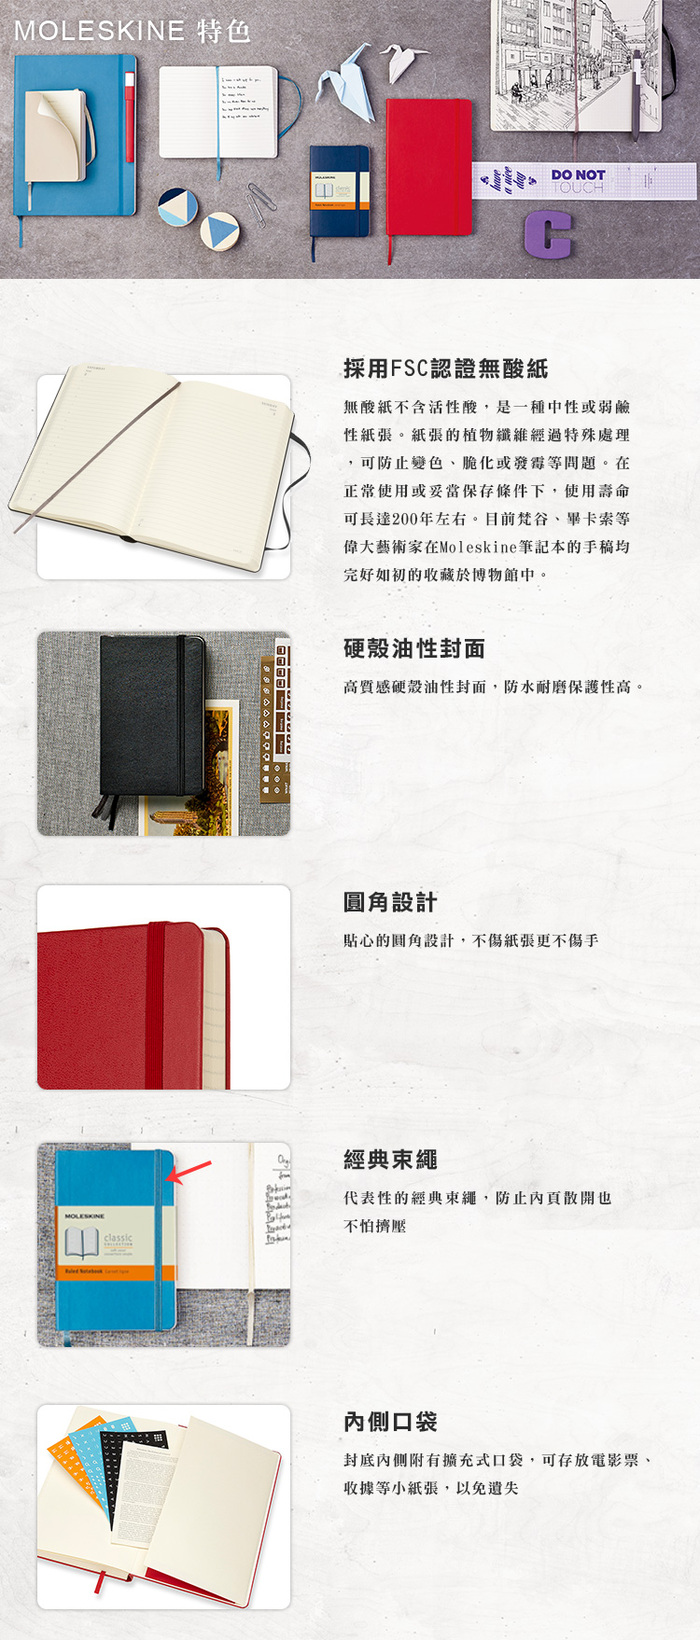 MOLESKINE 白雪公主限定版筆記本-口袋型橫線蘋果